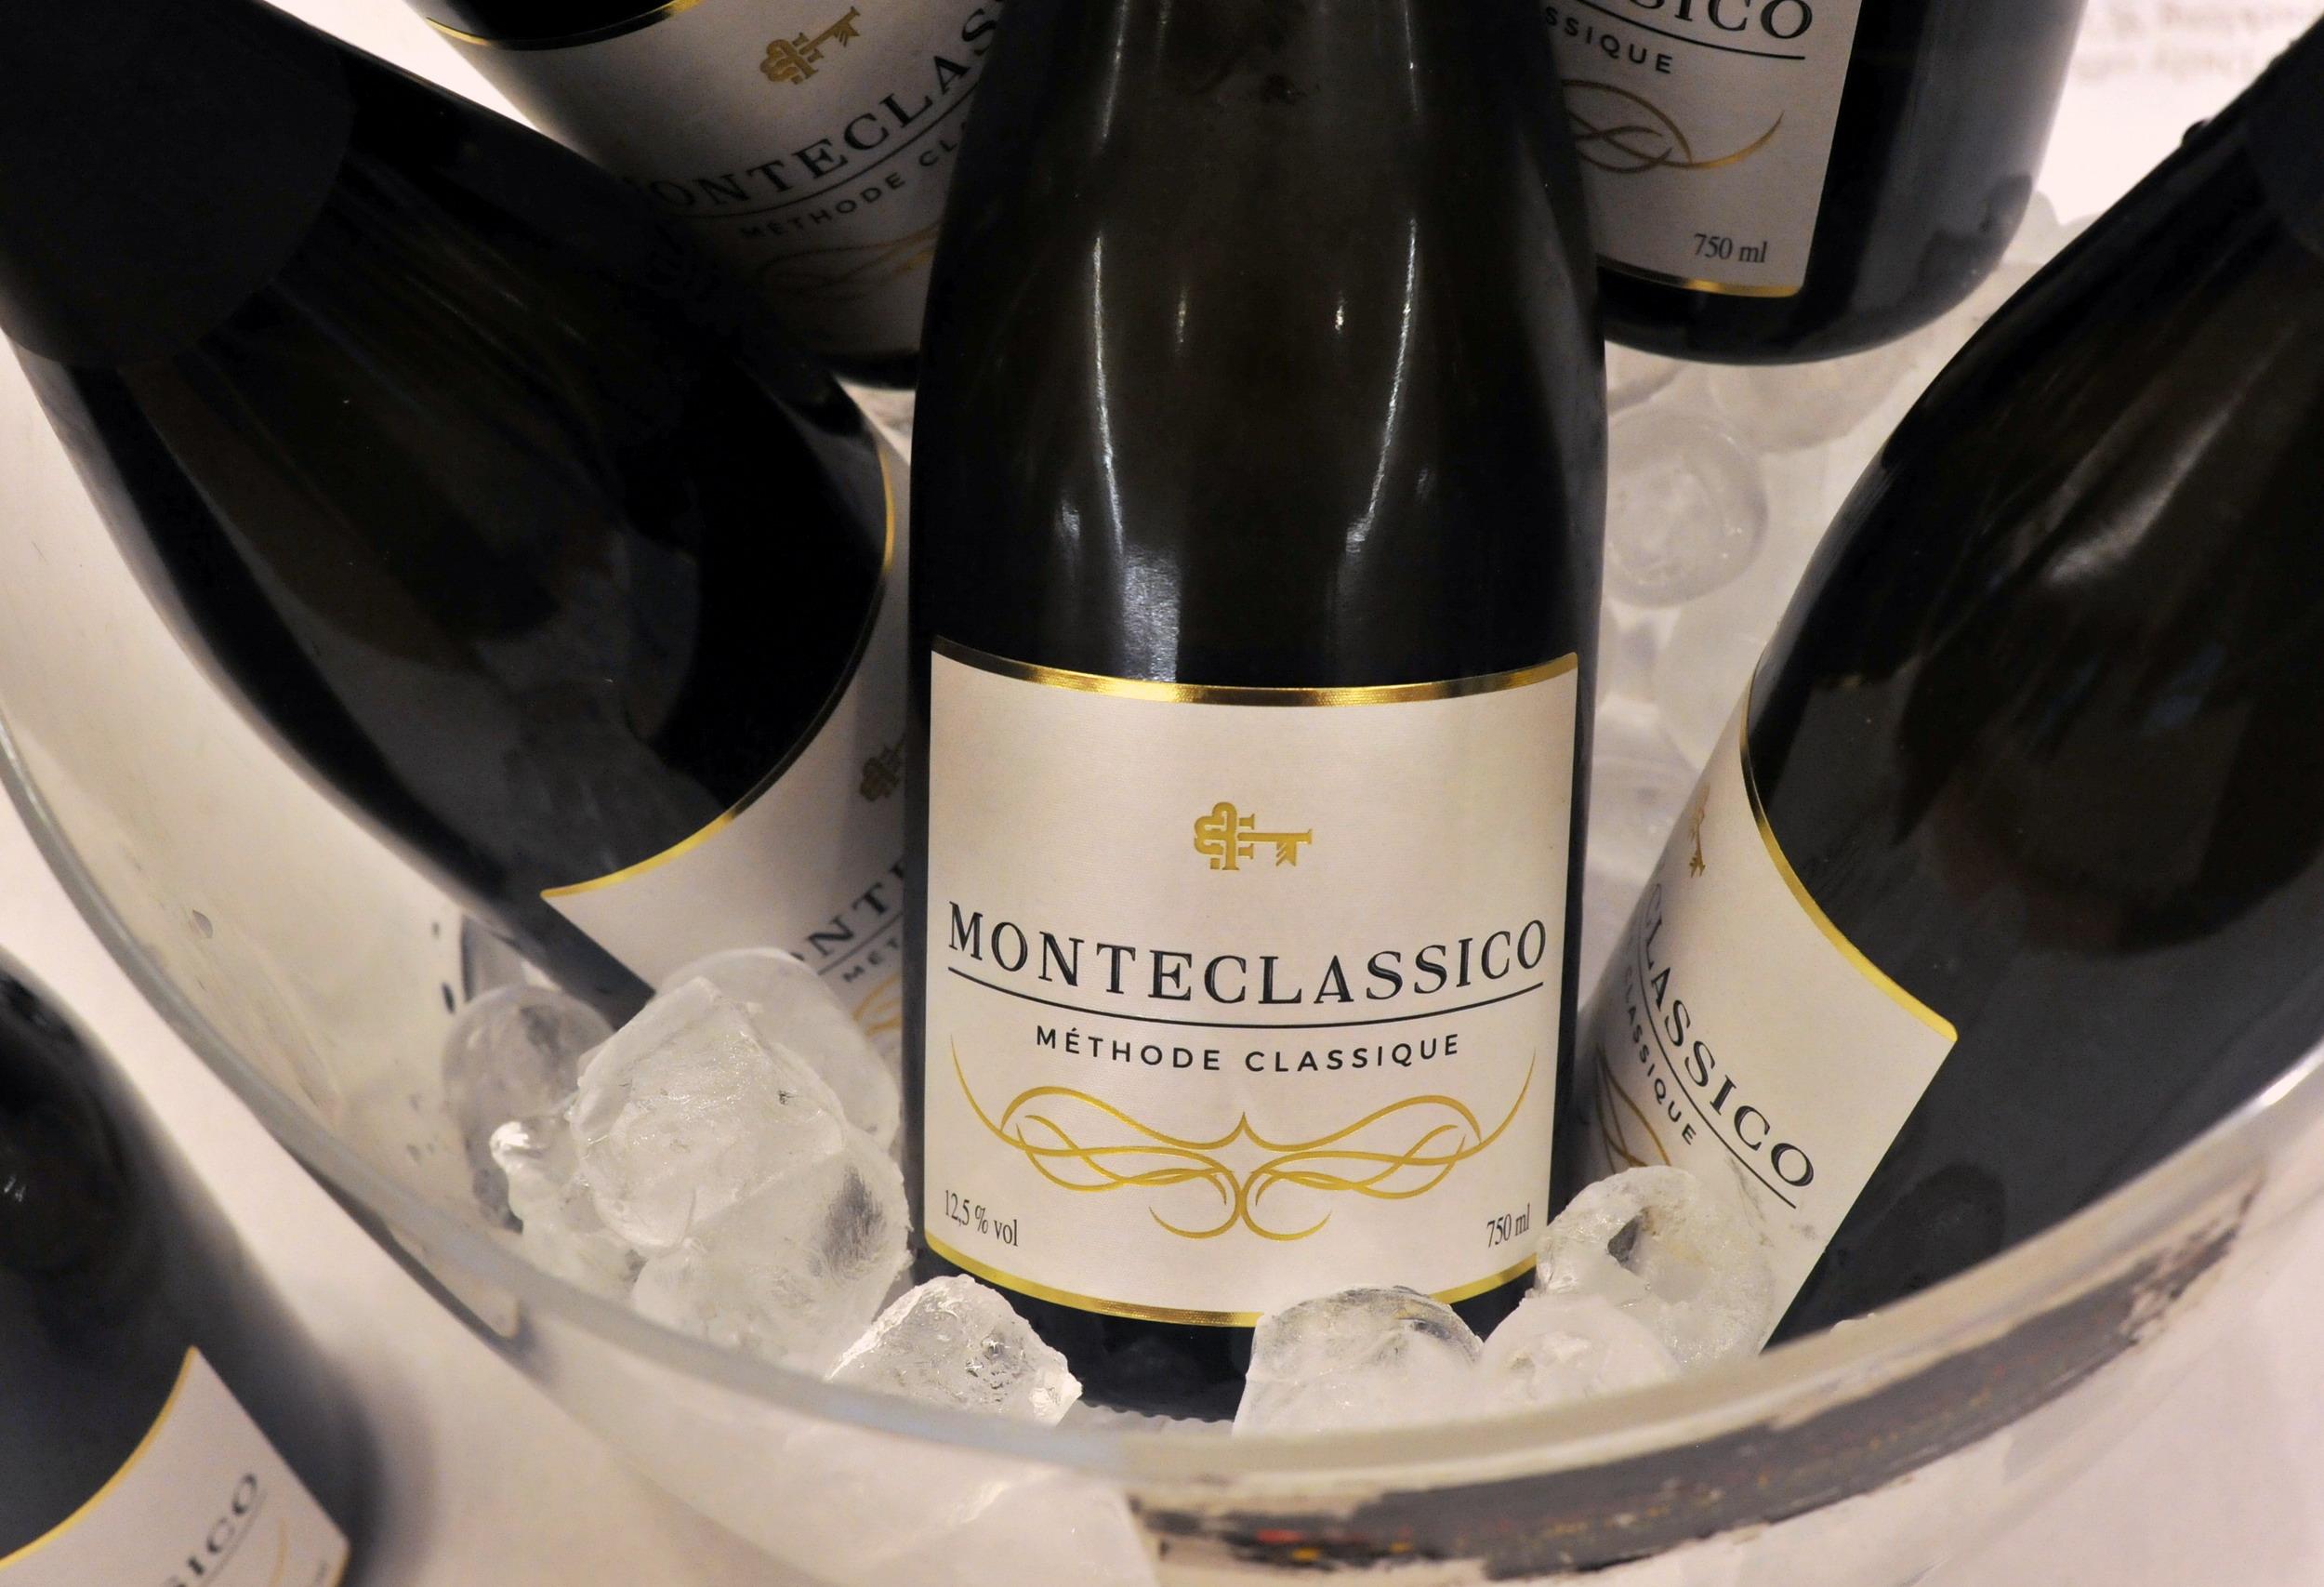 #WineWednesdayAfterWork @ Basement no. 9 – MONTE ROSSO